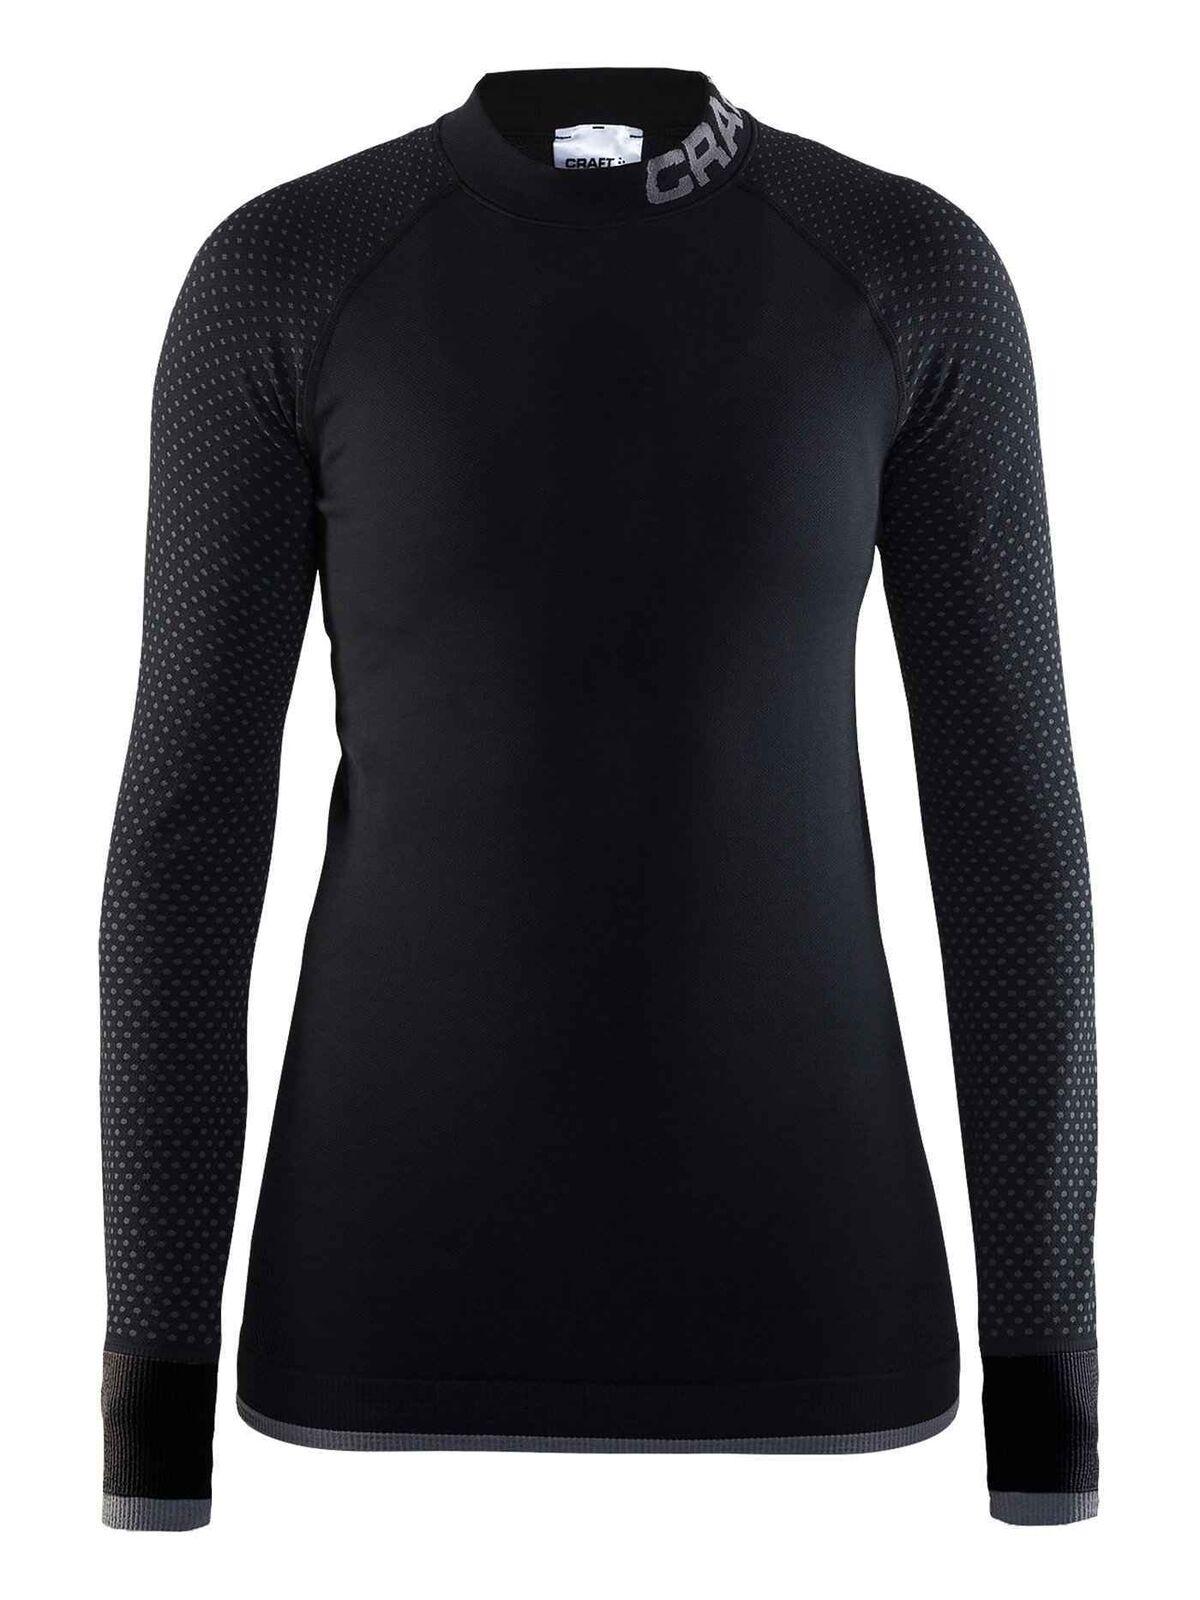 CRAFT Damen Crewneck Longsleeve Shirt W Warm Intensity NEU & OVP